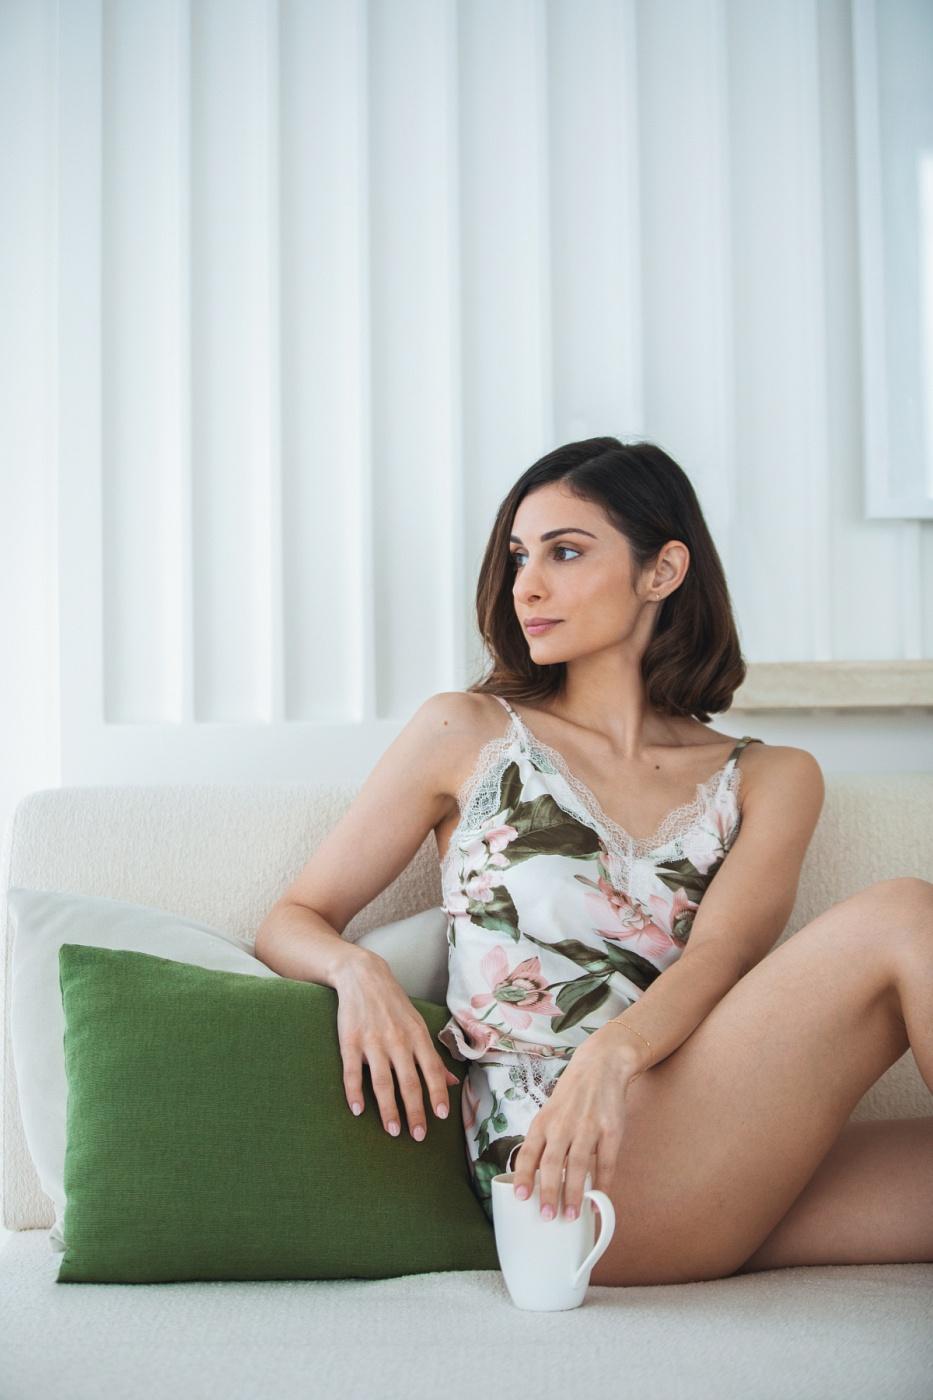 Ms Natalia Hale